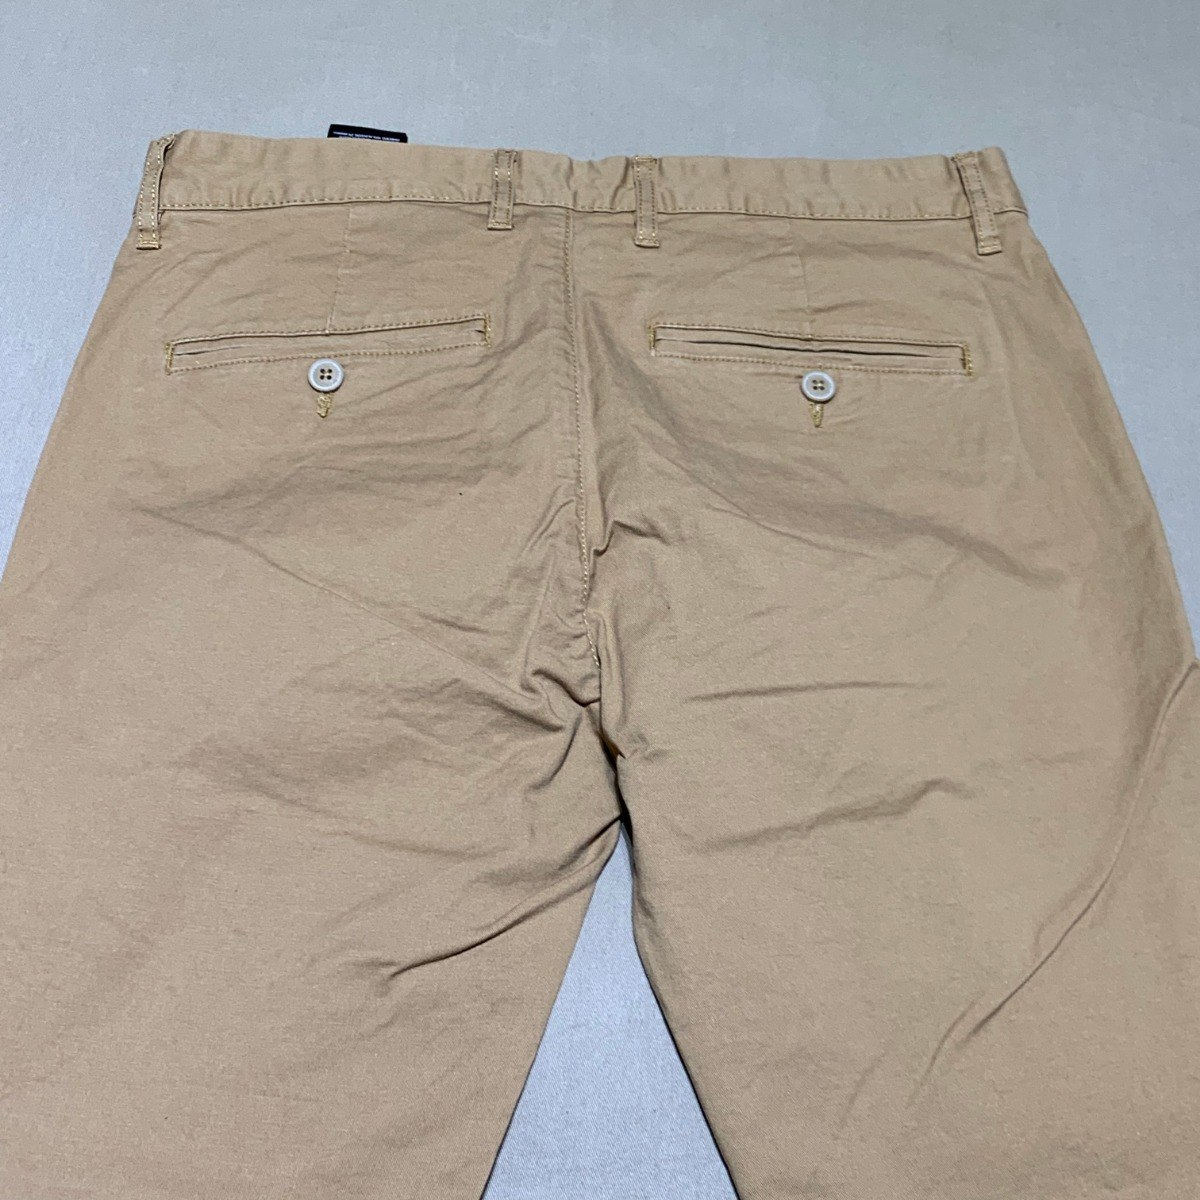 e35693cbe4f pantalon importado h hombre Cargando amp m zoom chino BWar1qnB